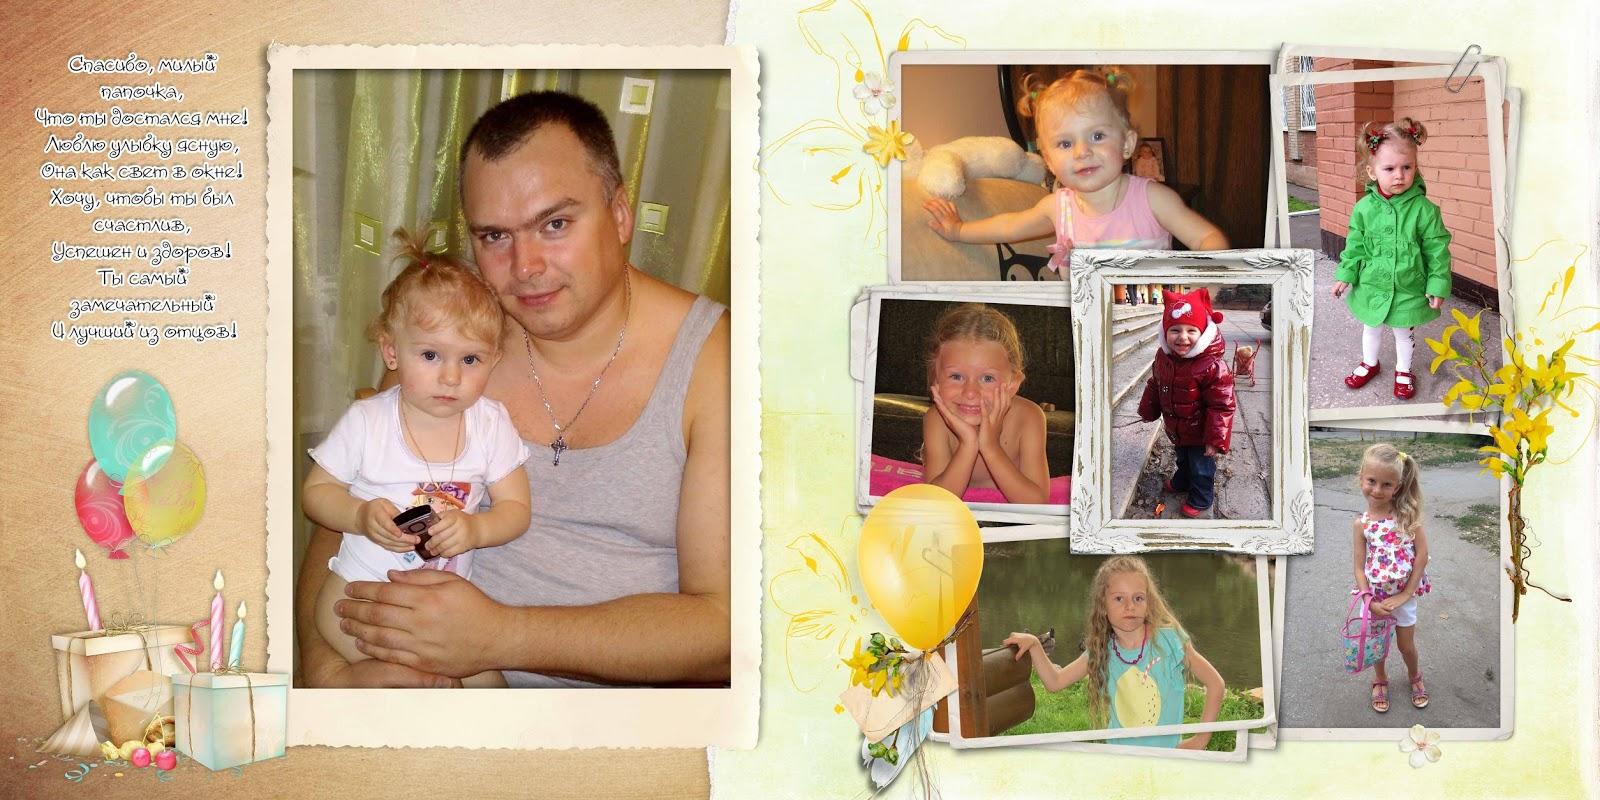 Поздравления с днем рождения отцу от дочери фото